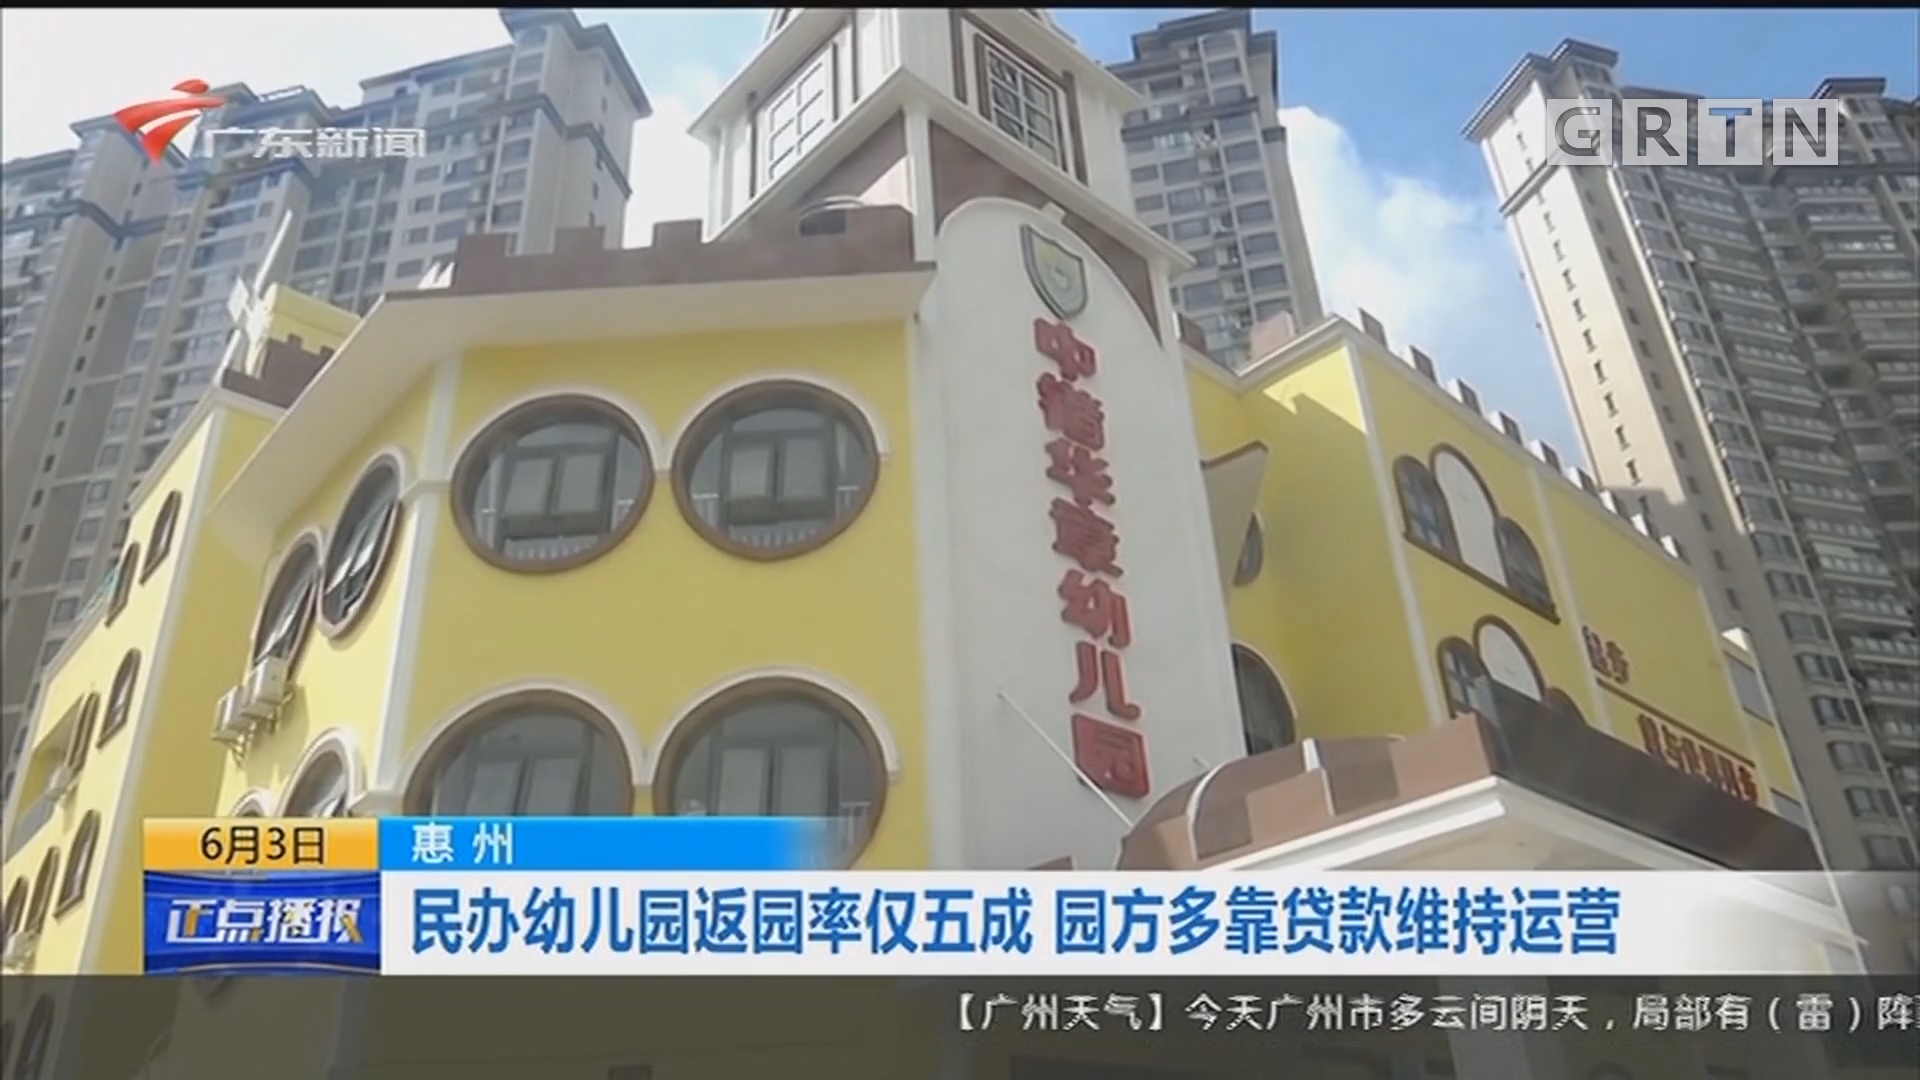 [HD][2020-06-03-14:00]正点播报:惠州 民办幼儿园返园率仅五成 园方多靠贷款维持运营